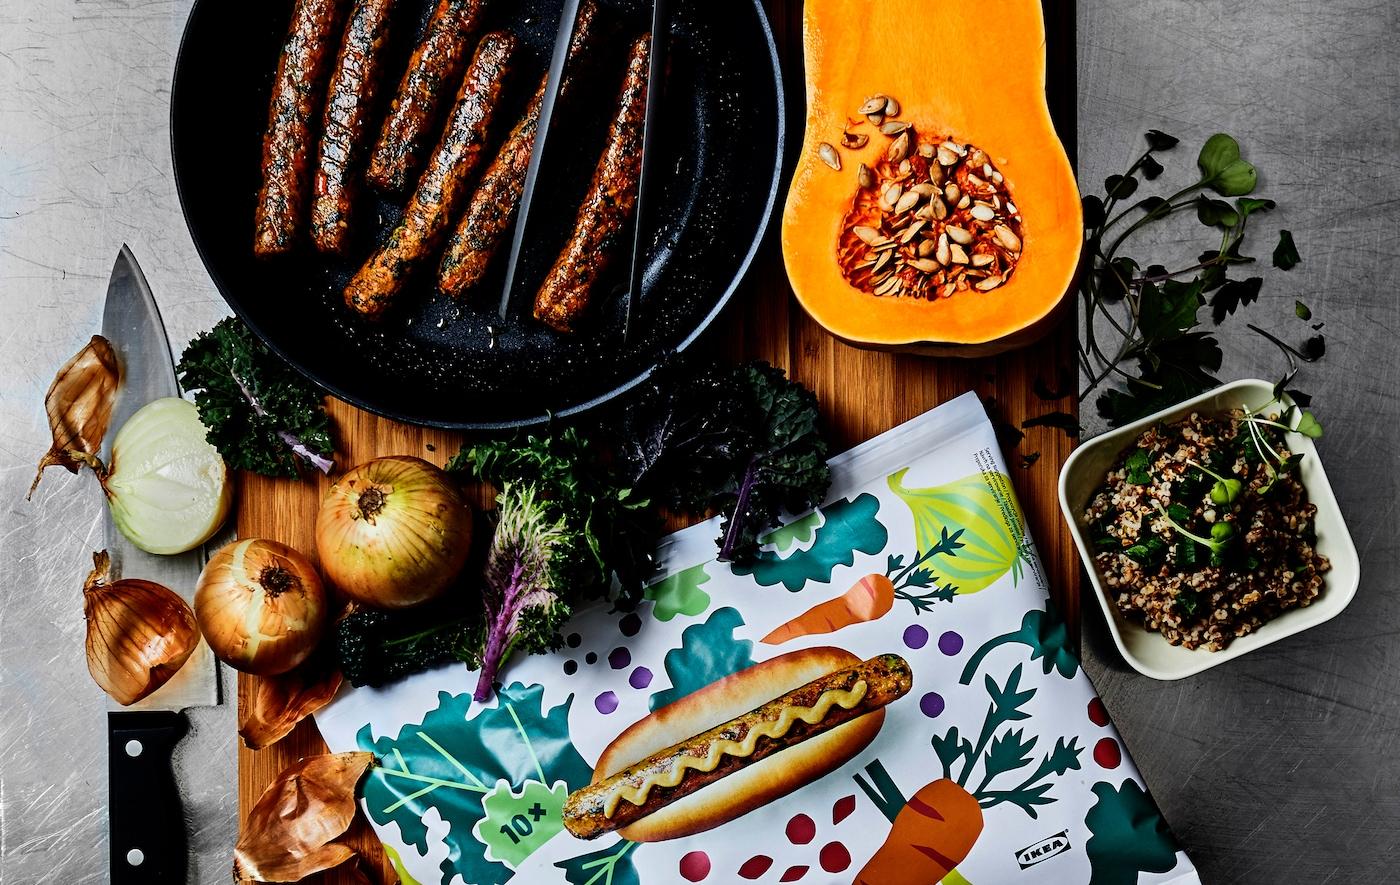 3 ricette con gli hot dog vegetariani korvmoj ikea for Cucinare hot dog